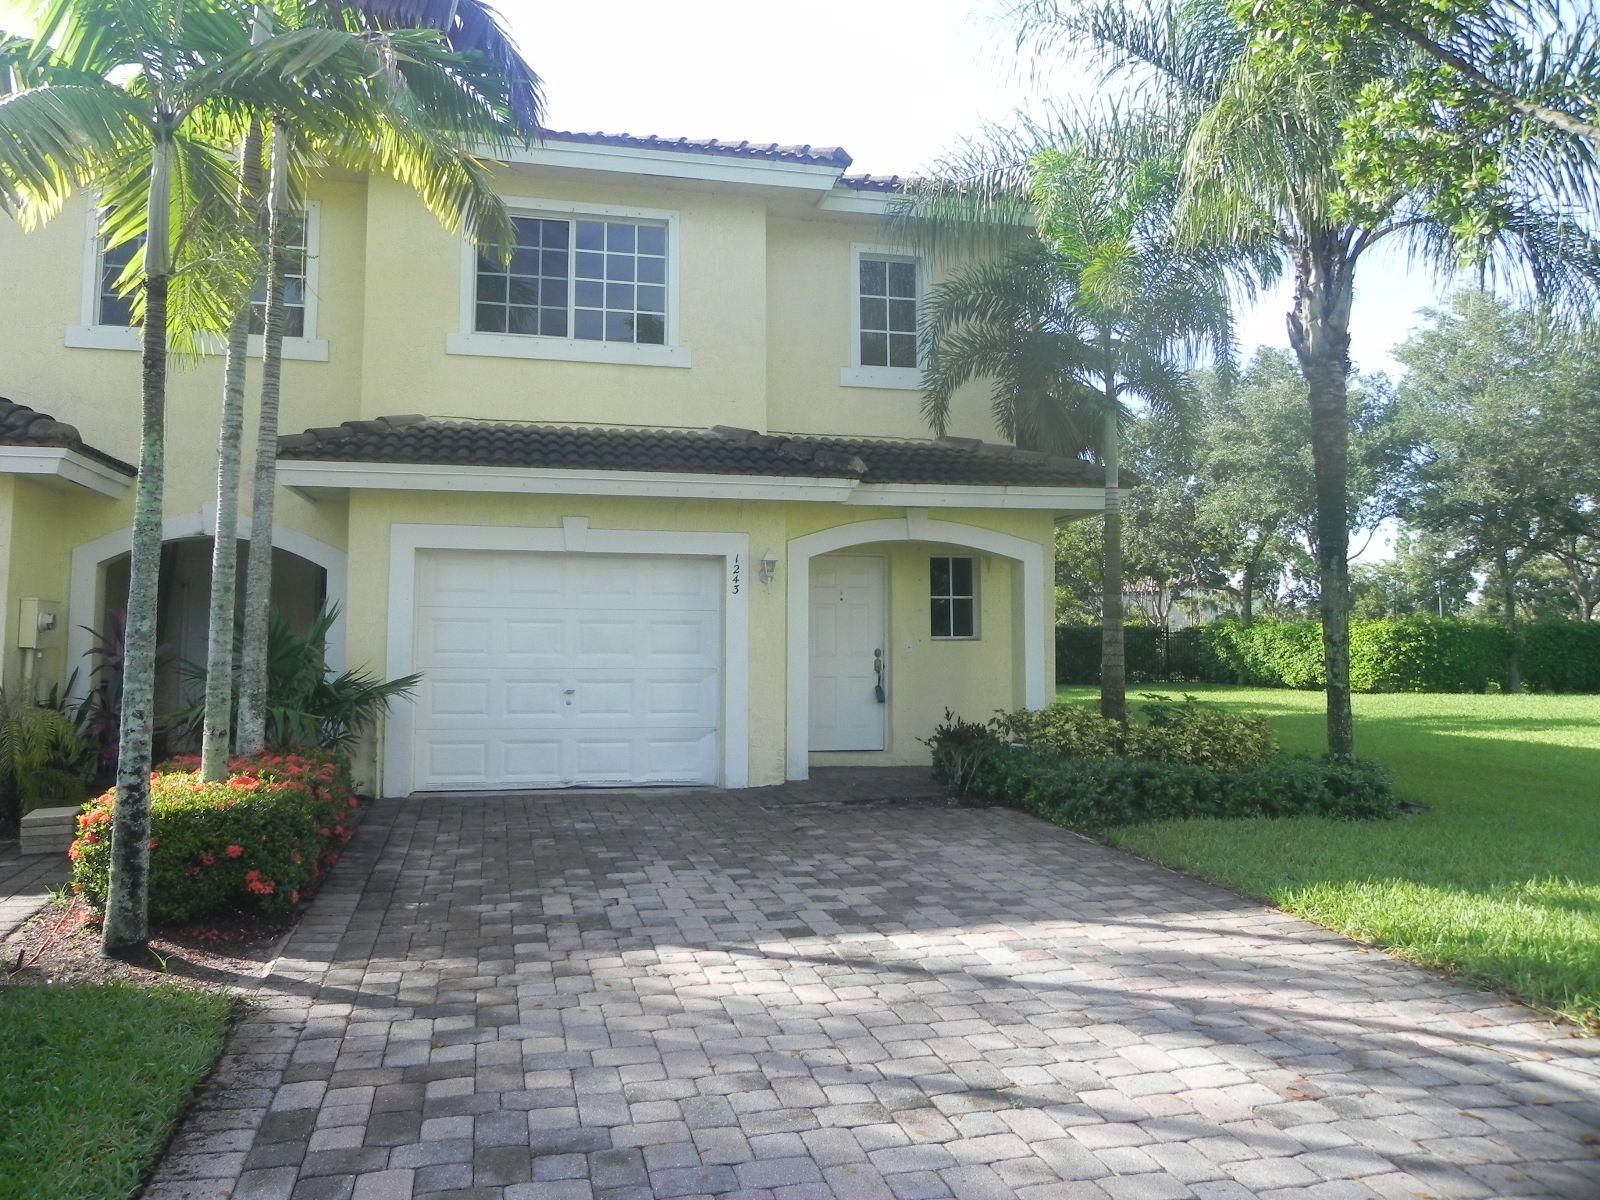 Photo of  West Palm Beach, FL 33413 MLS RX-10552568